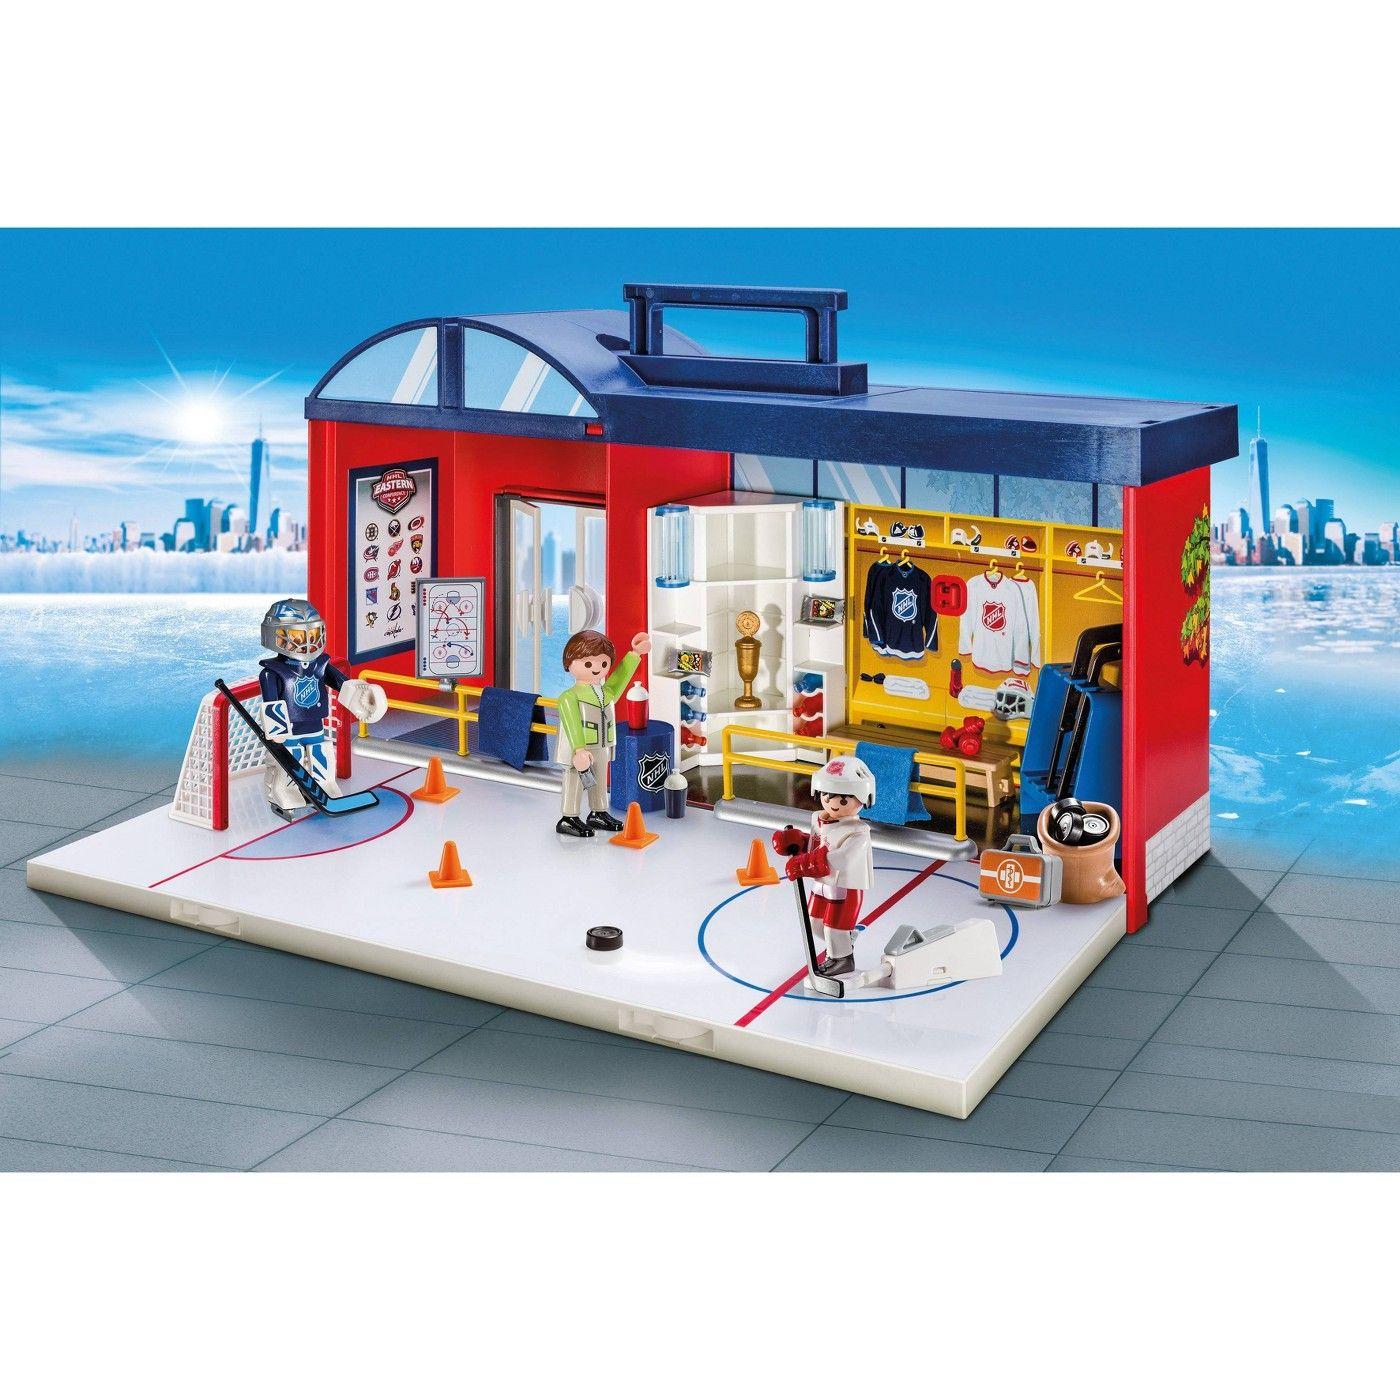 Playmobil Nhl Take Along Arena In 2020 Lego Hockey Nhl Toys R Us Canada